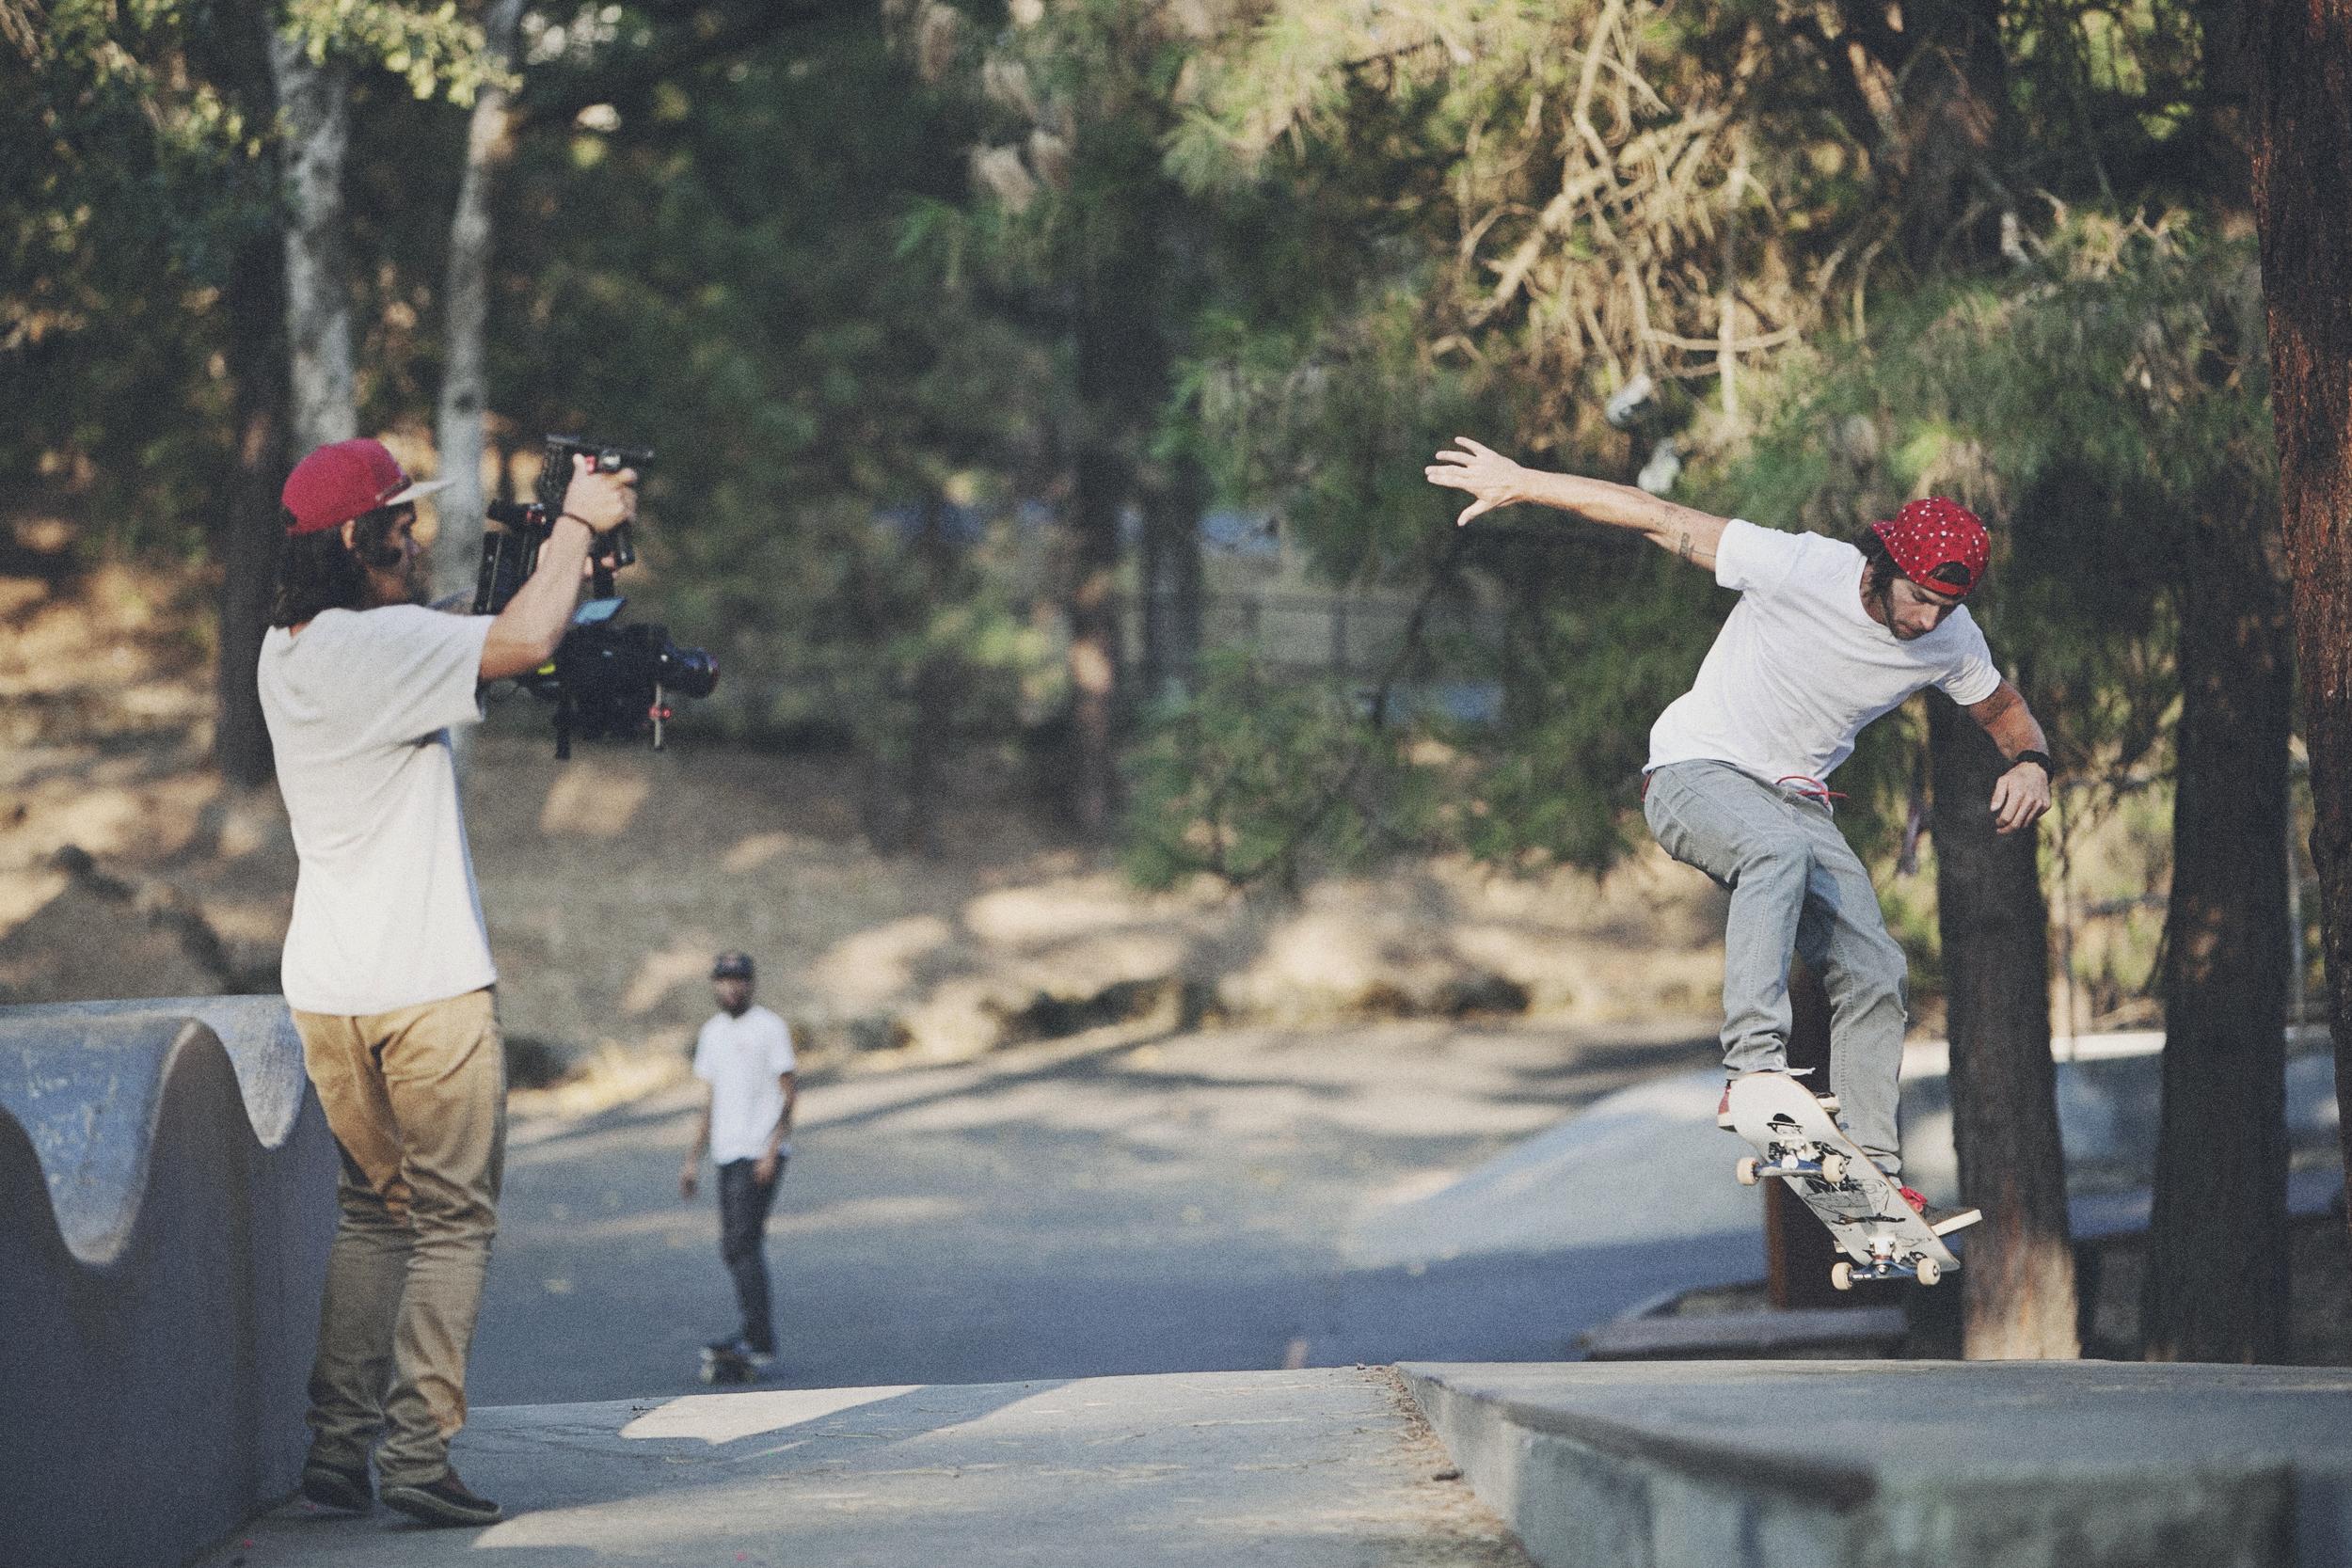 Outlive-Creative-Video-Production-Portland-Photographer-Filmmaker-Cinematographer-Graphic-Design